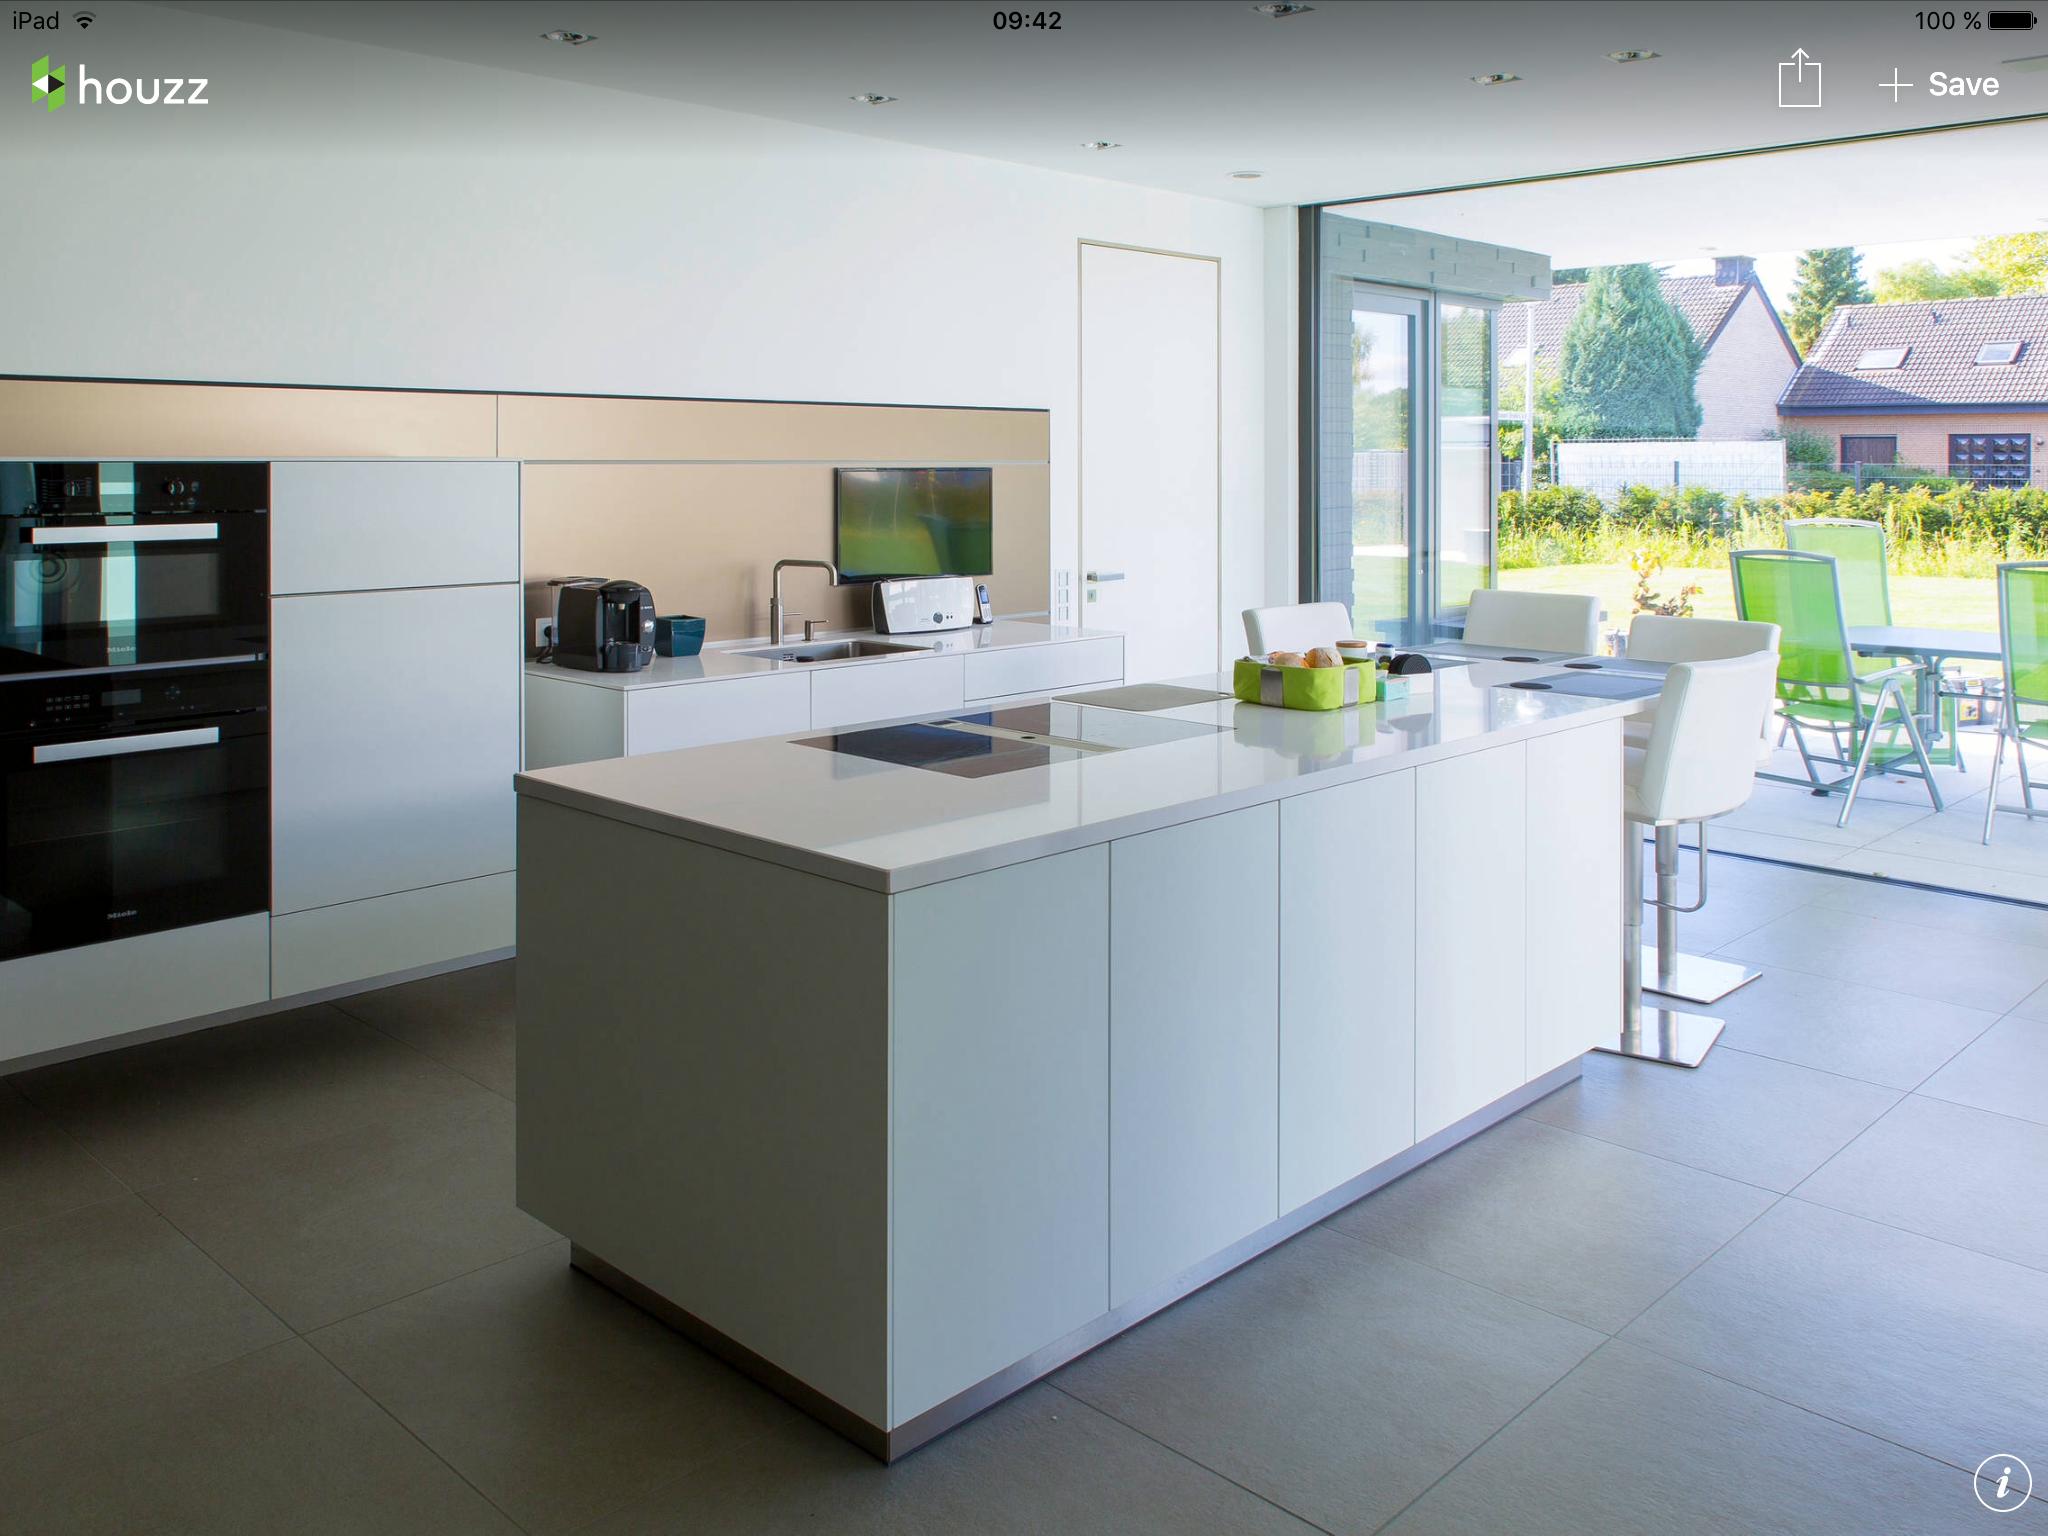 Matt white cabinets with shiny white countertop | House - Kitchen ...